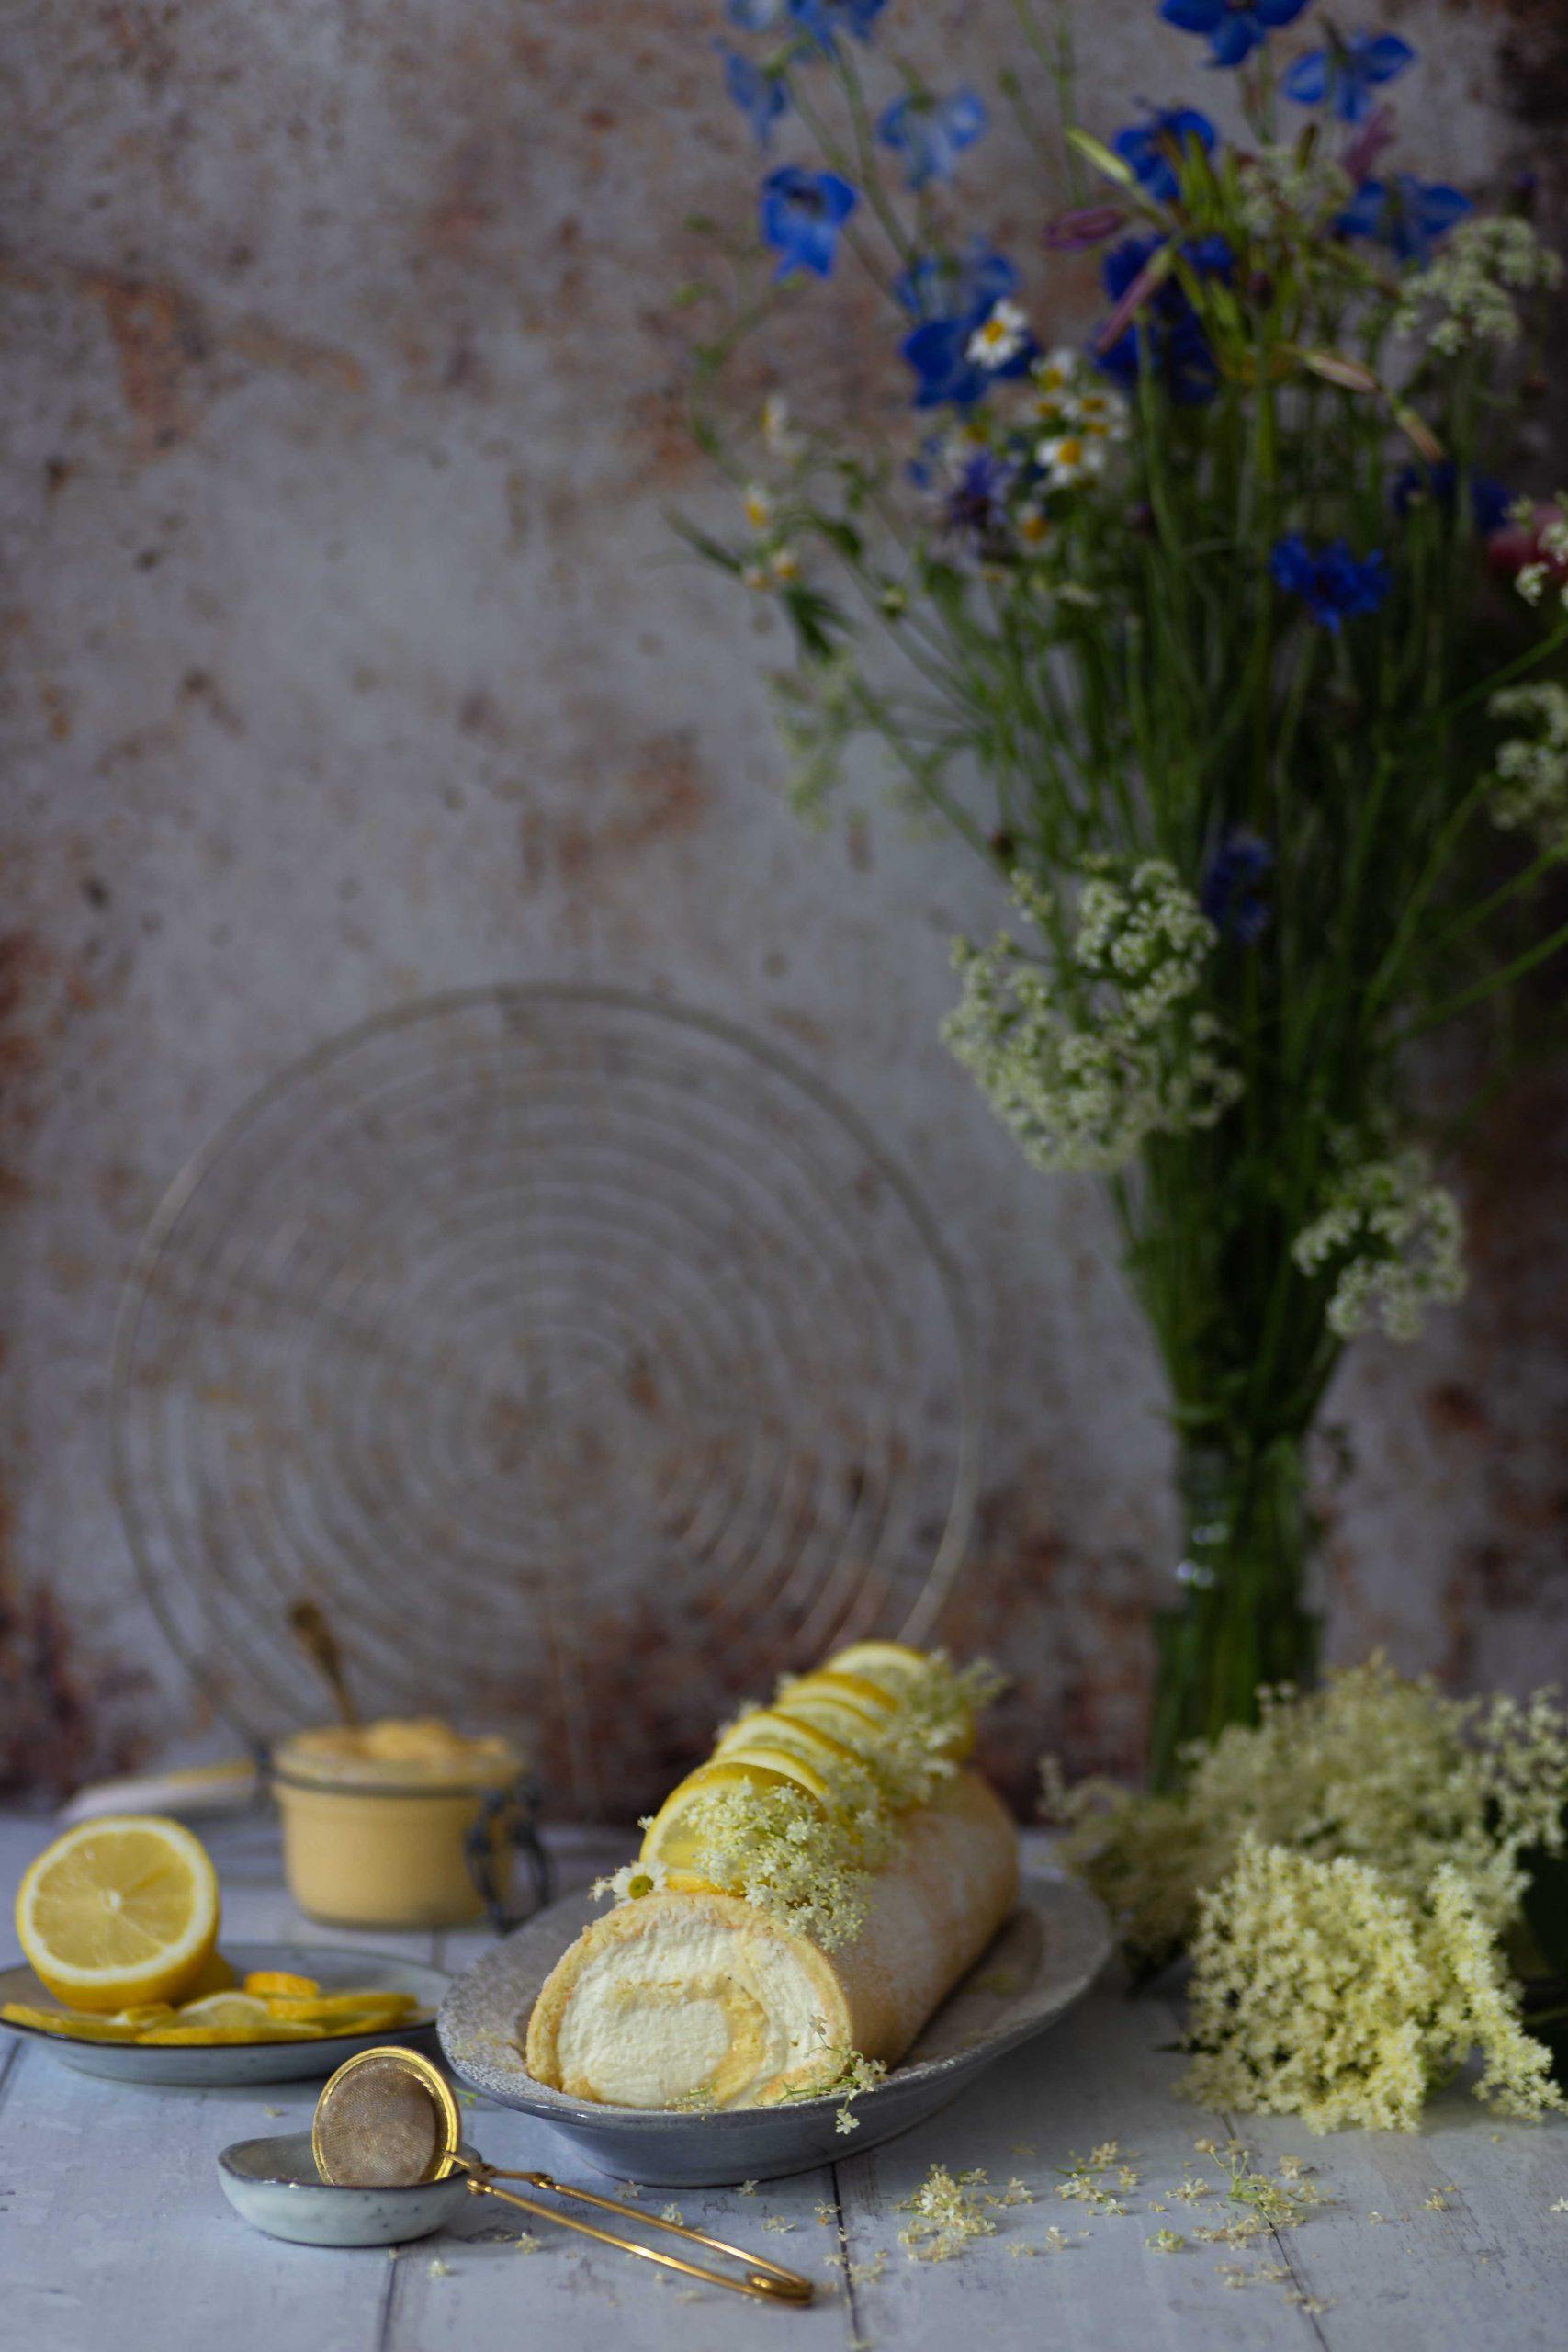 Zitronenrolle | Zitronige Biskuitrolle mit Lemon Curd | Rezept